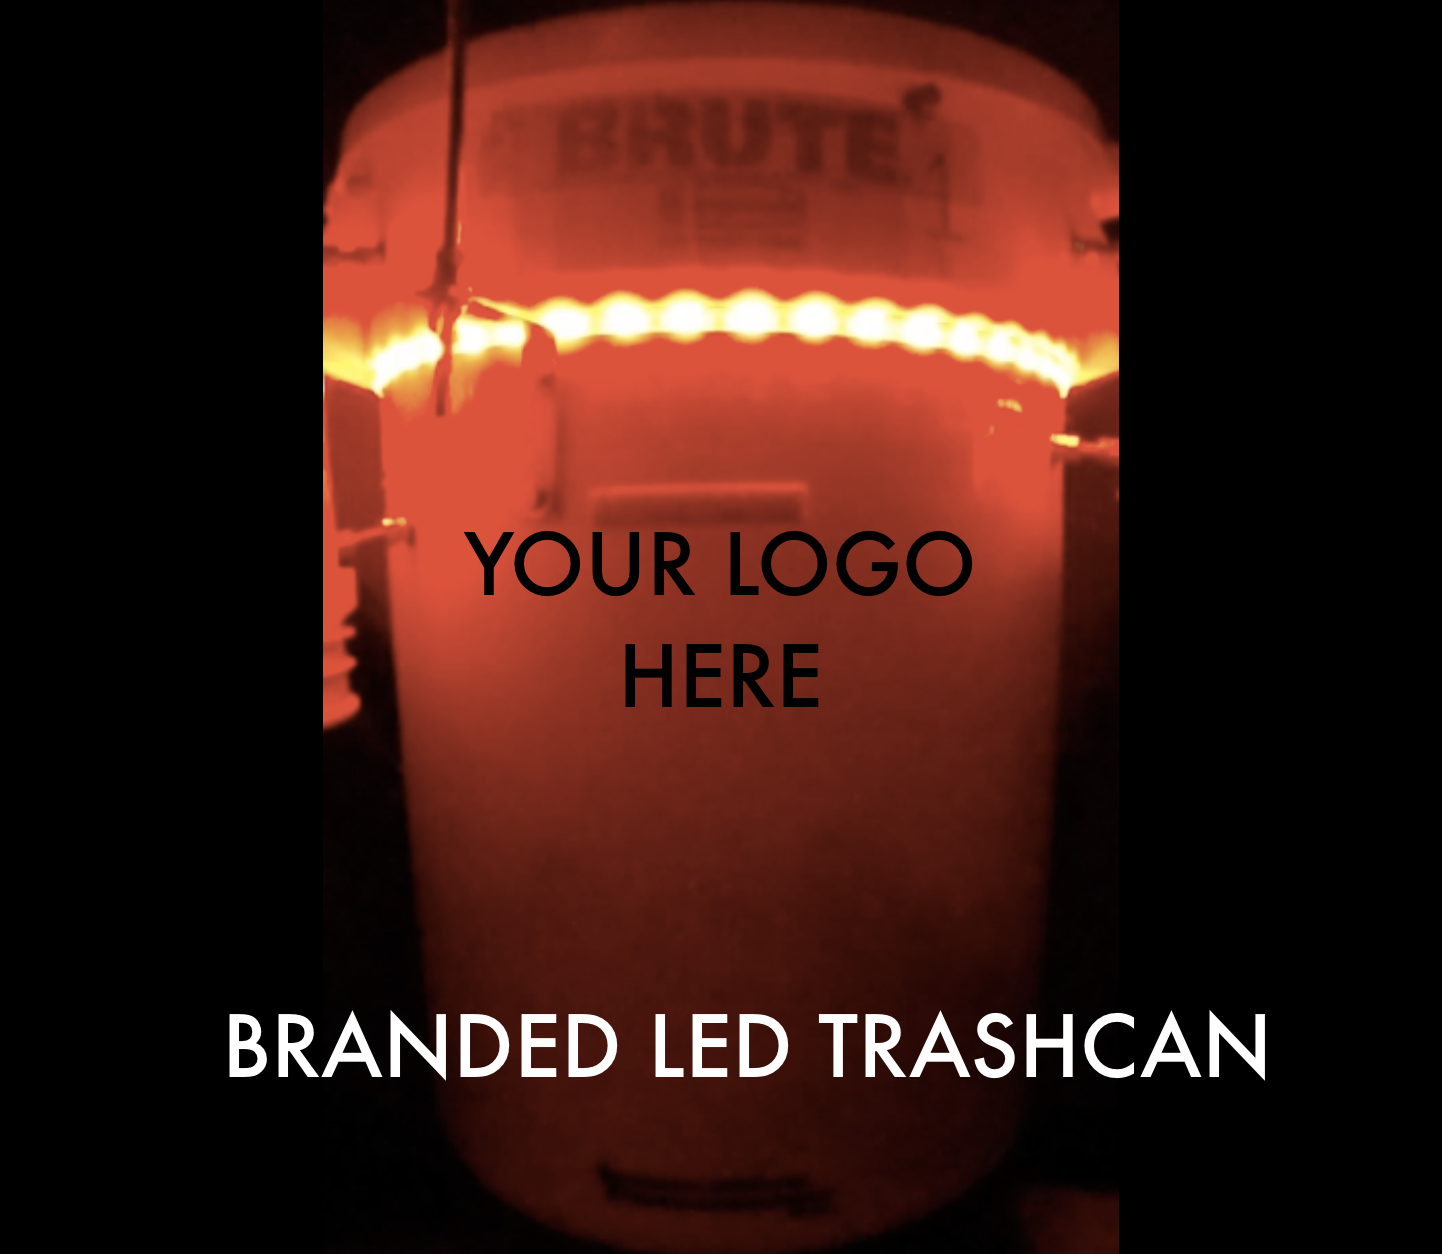 LED TCP Branded Trashcan